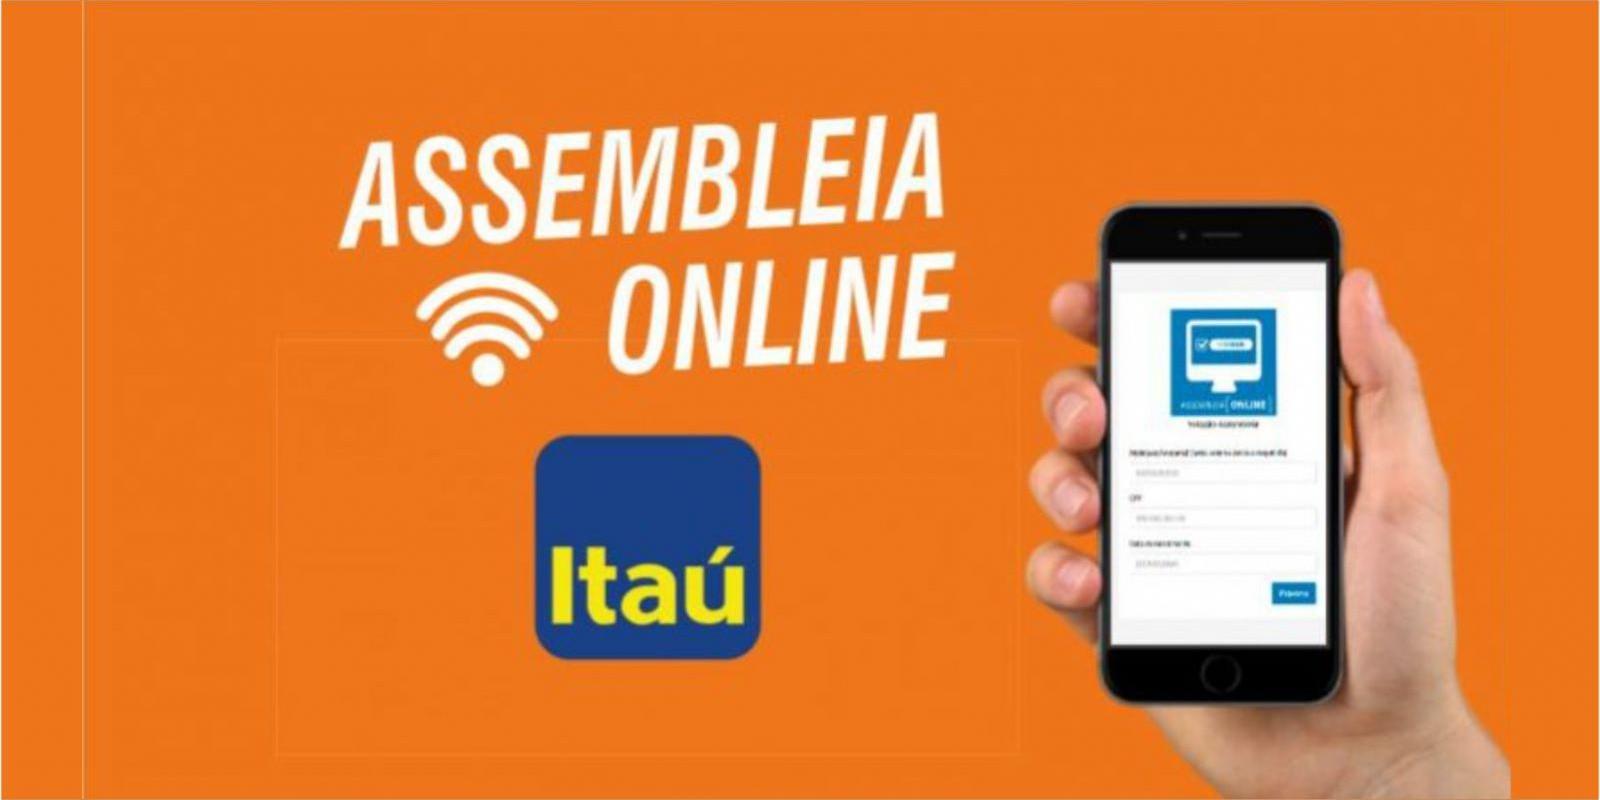 Sindicato realiza assembleia virtual sobre Teletrabalho do Itaú entre os dias 3 e 4 de dezembro